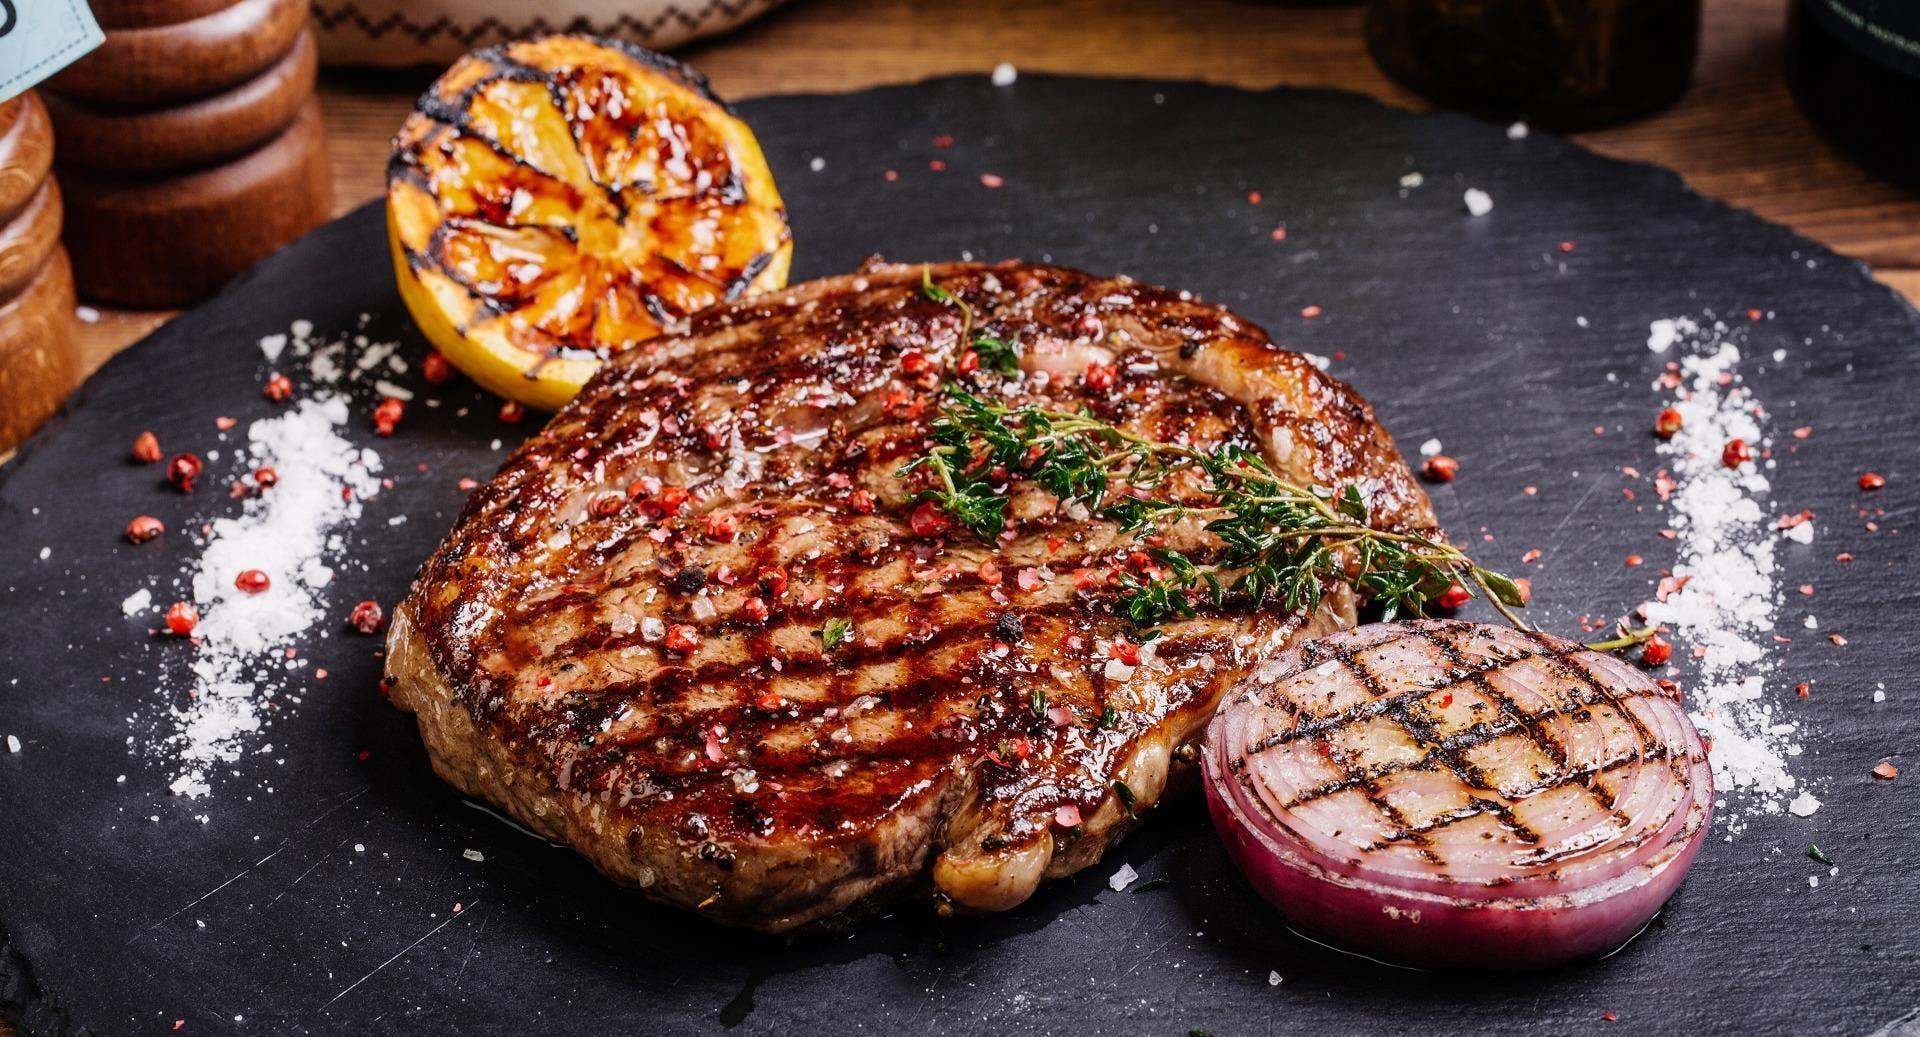 Beef Grill Club by Hasir - Wilmersdorf